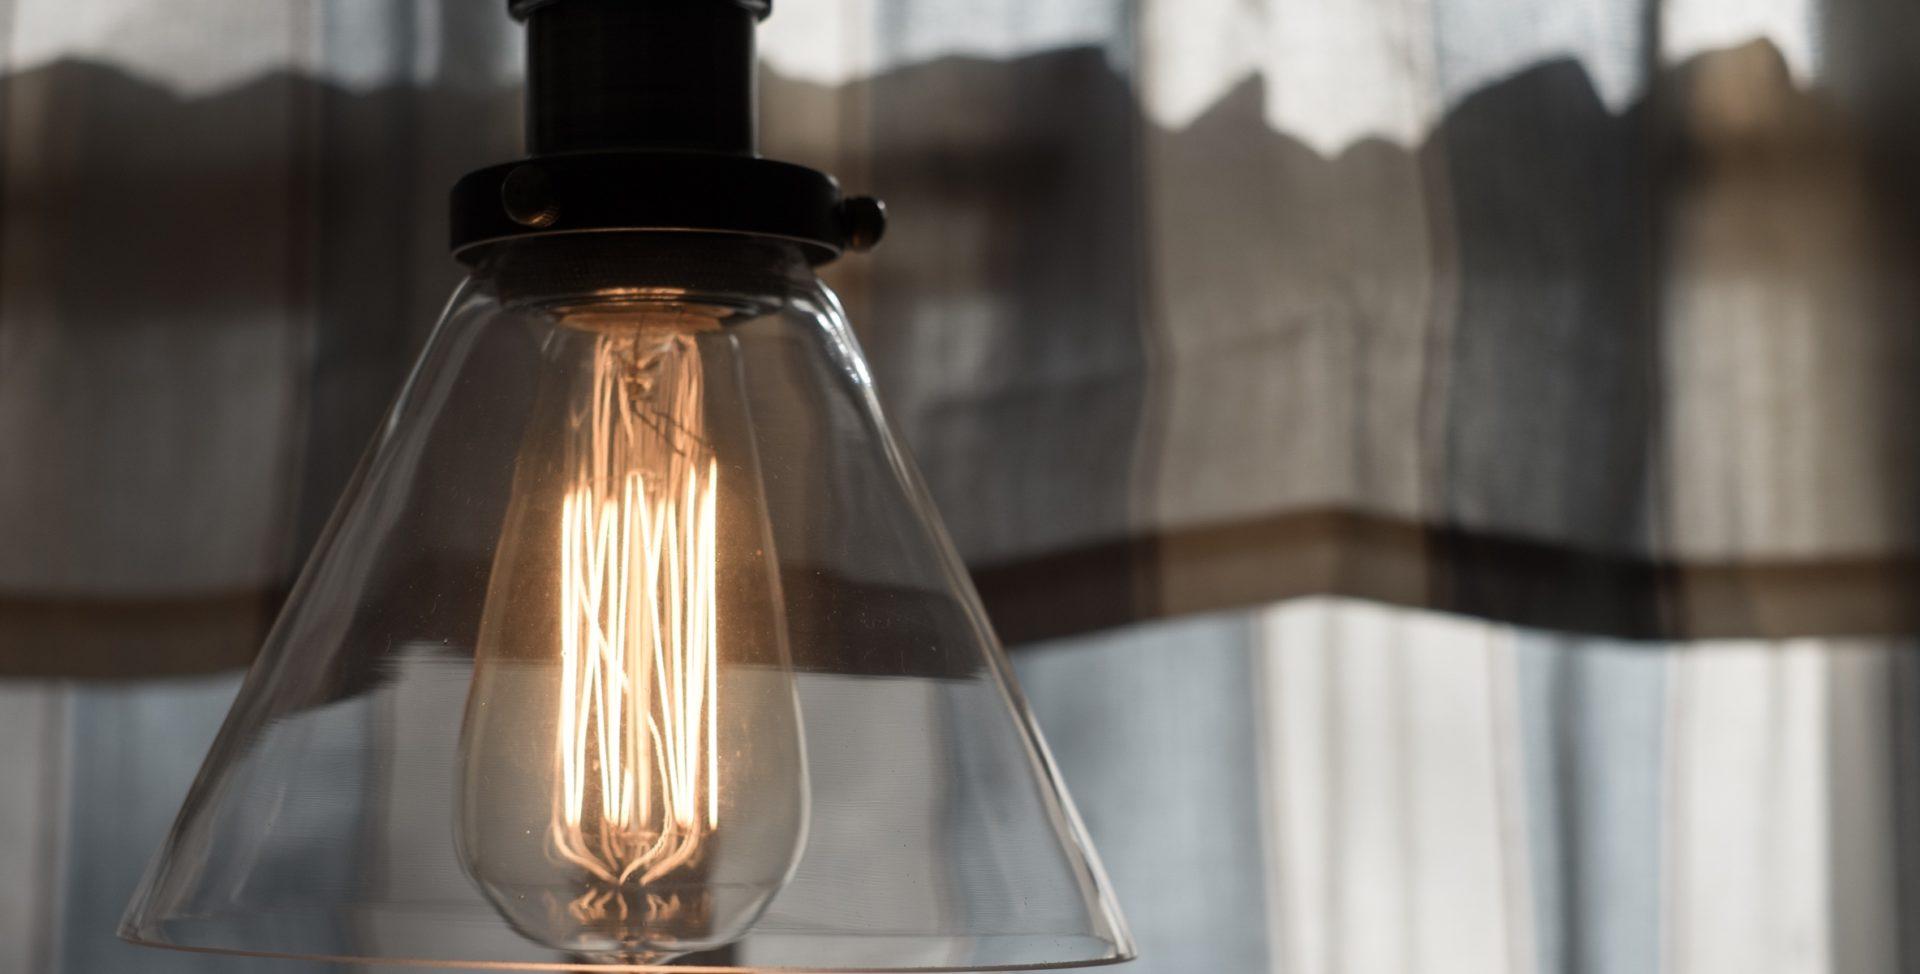 Filament lightbulb